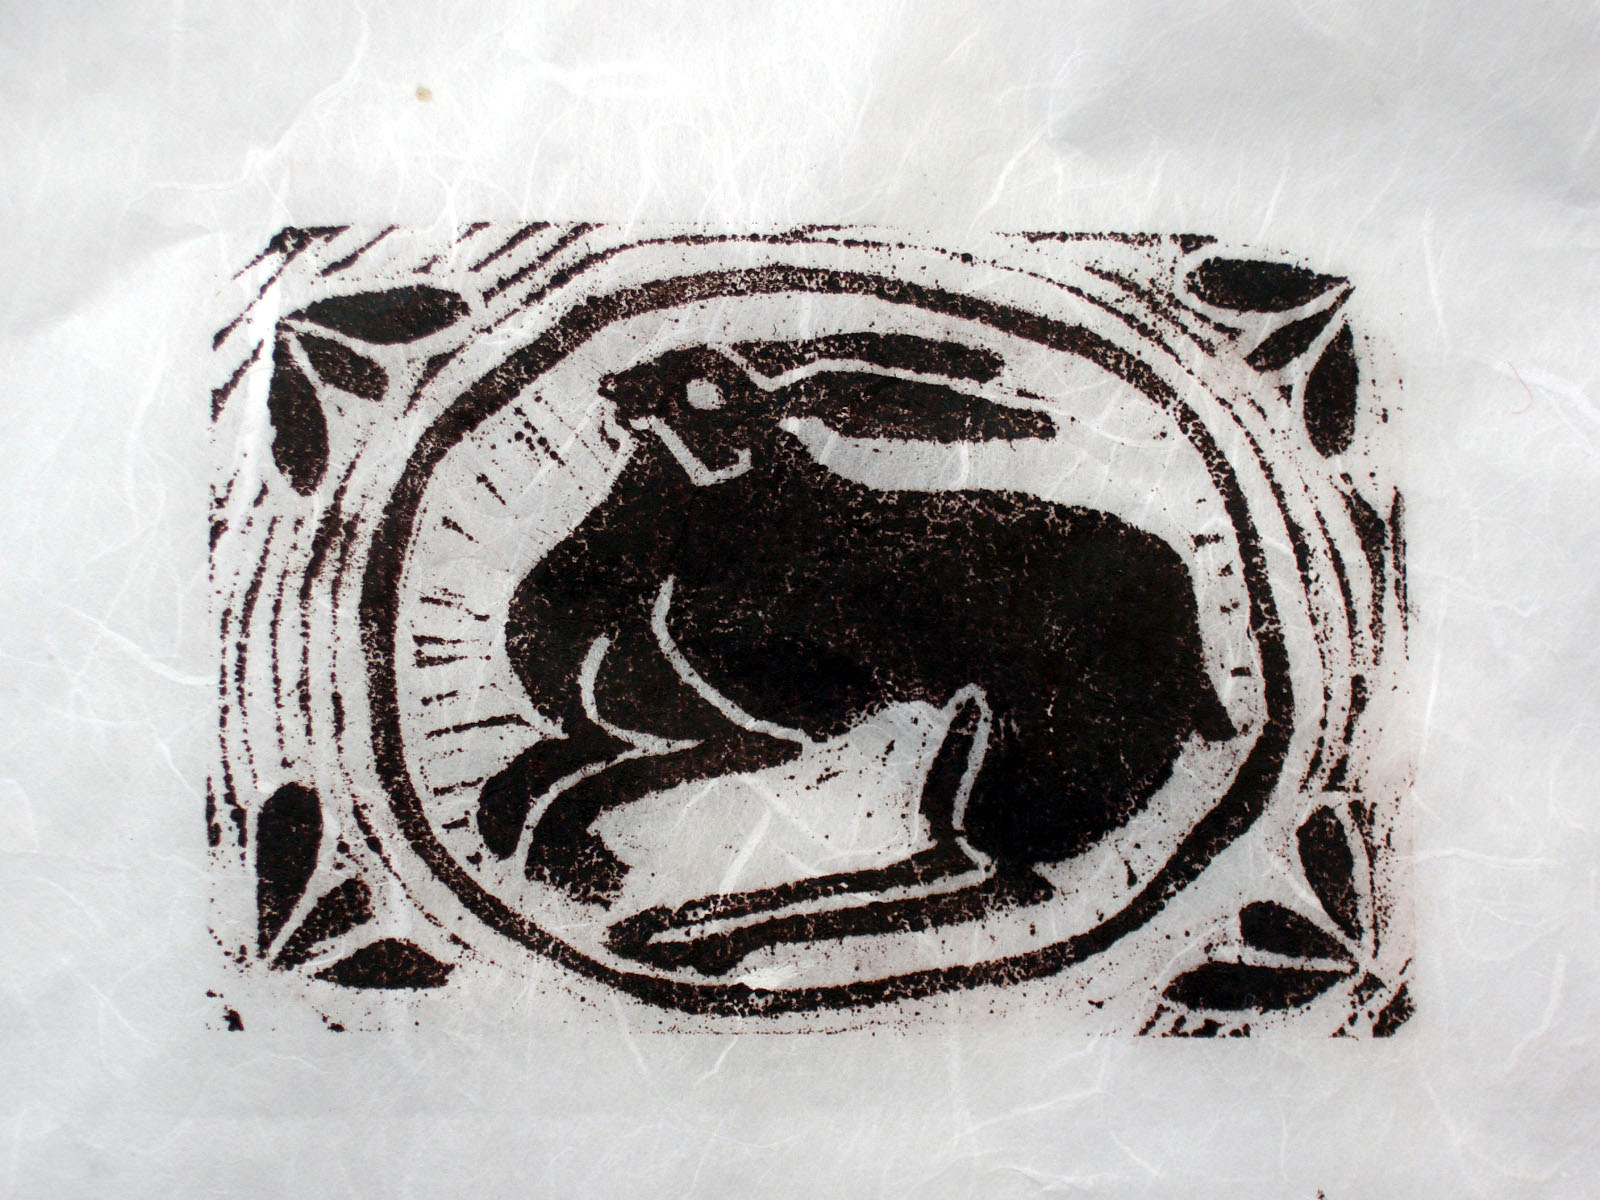 Helen Pakeman 'Nesting Hare'